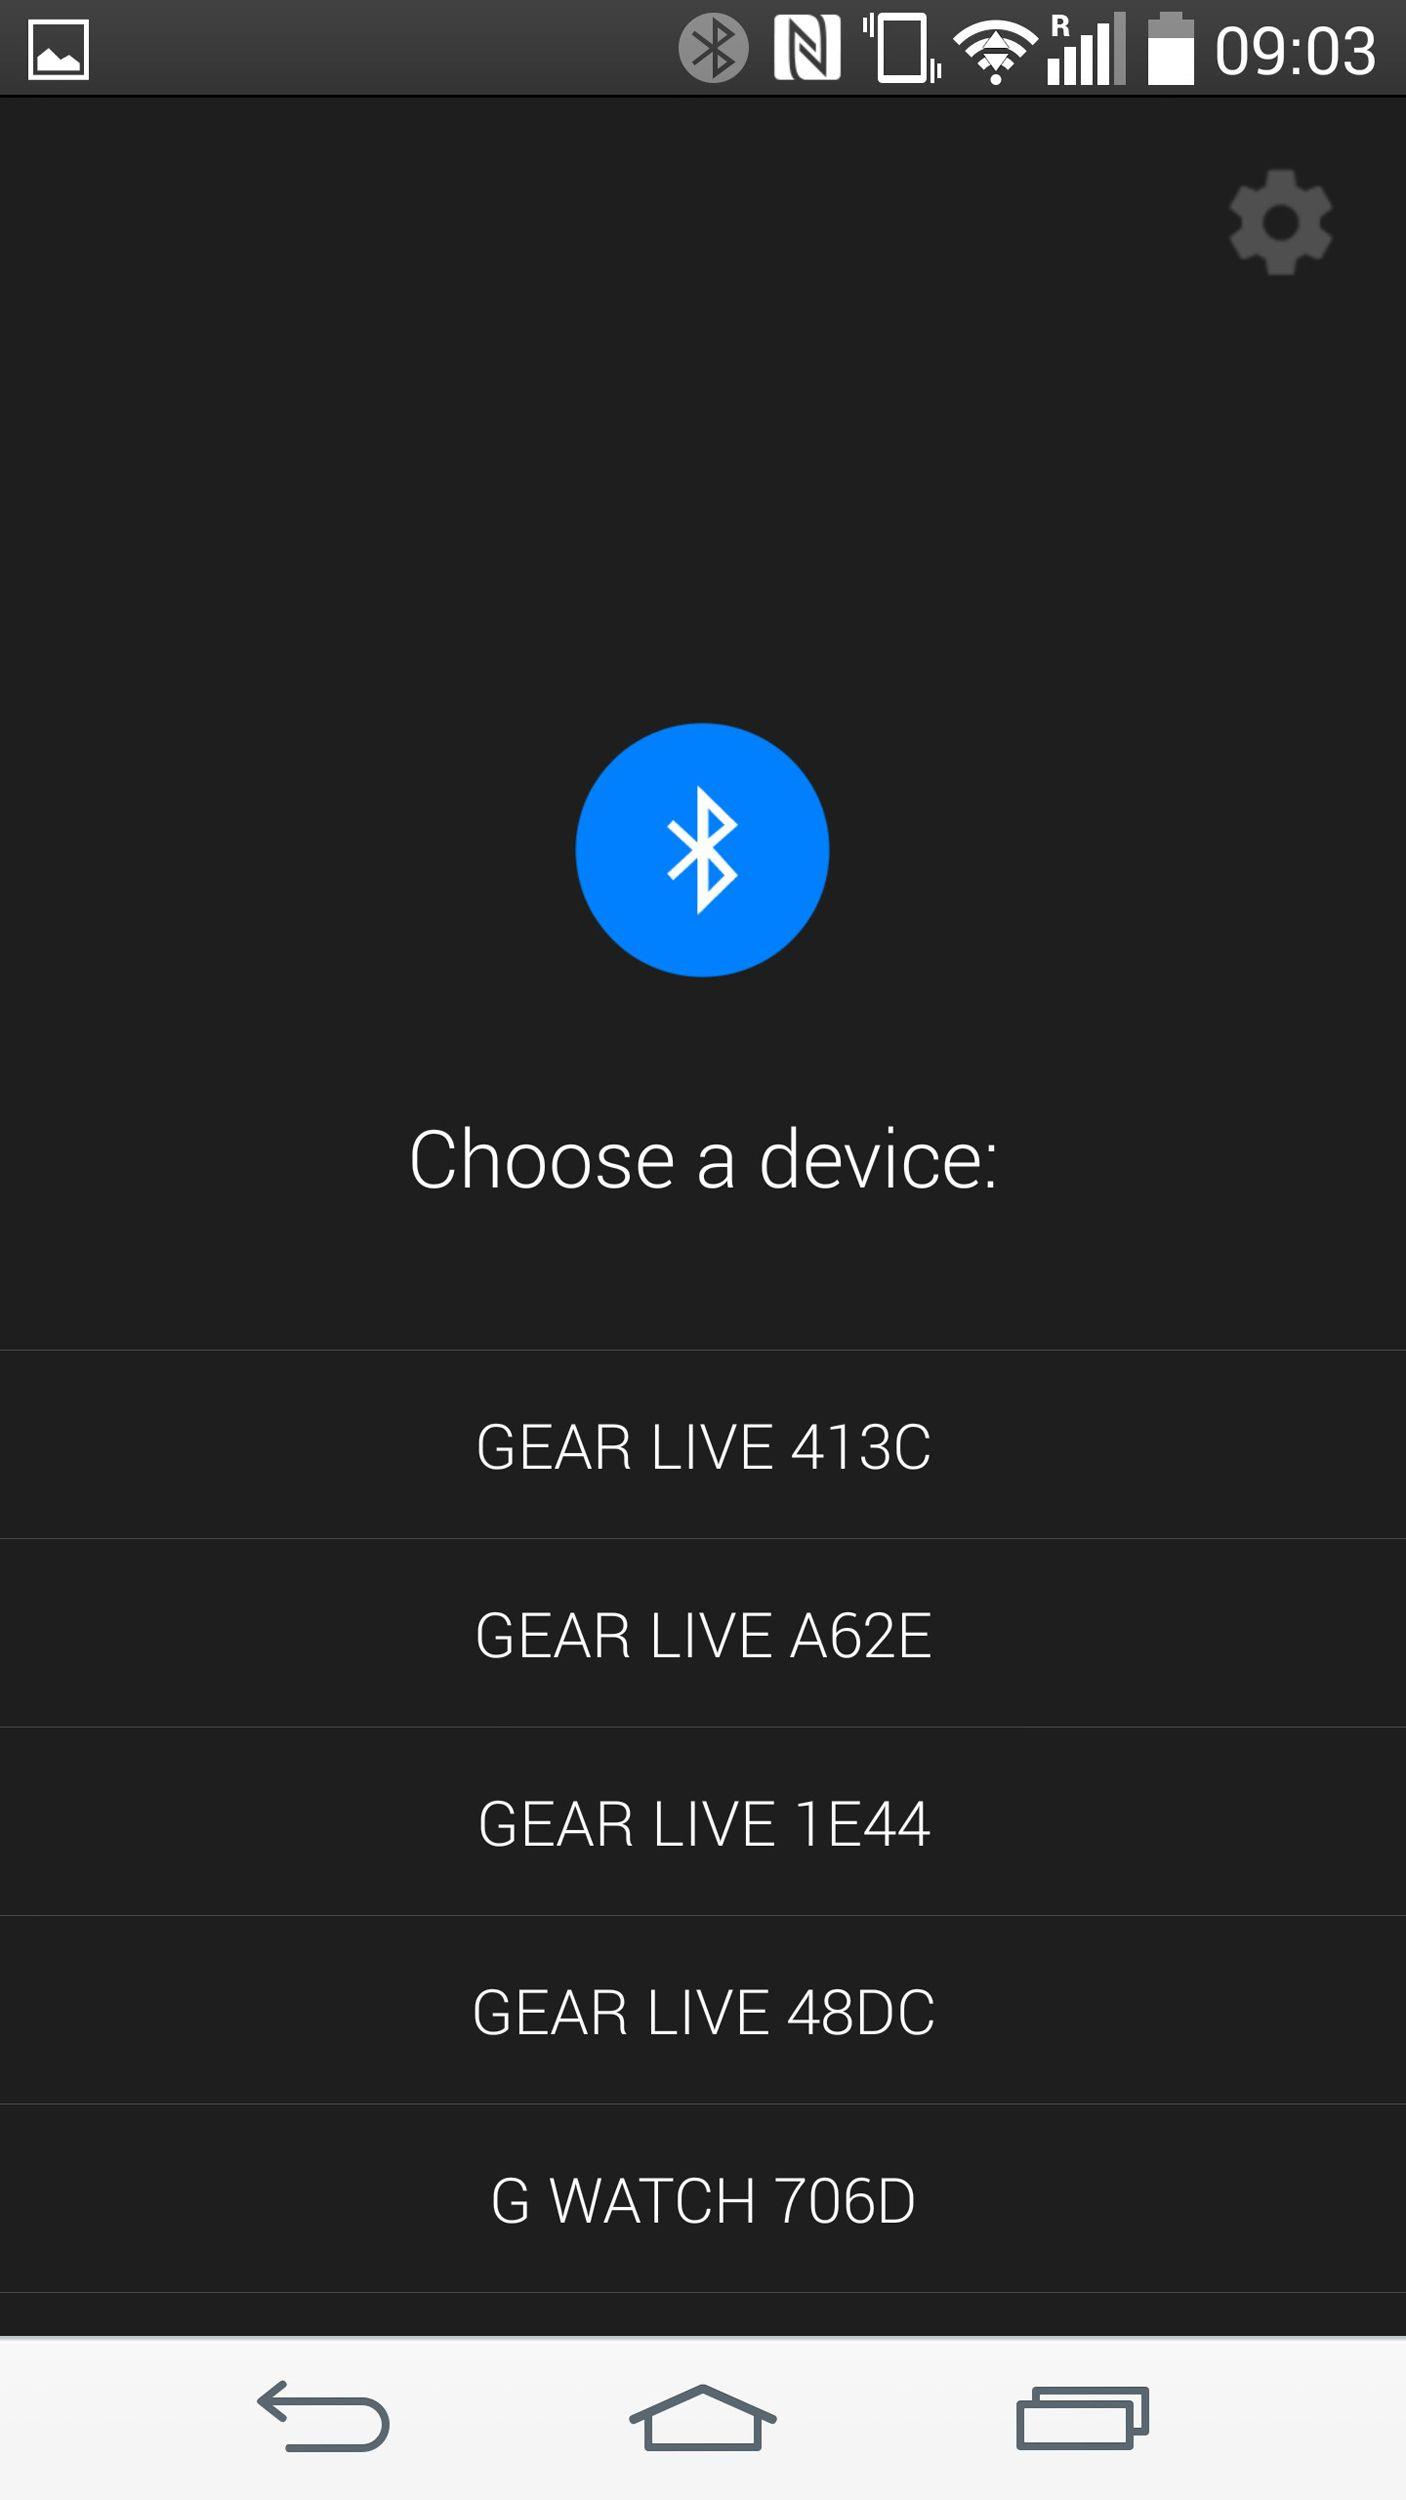 Samsung Gear Live 07